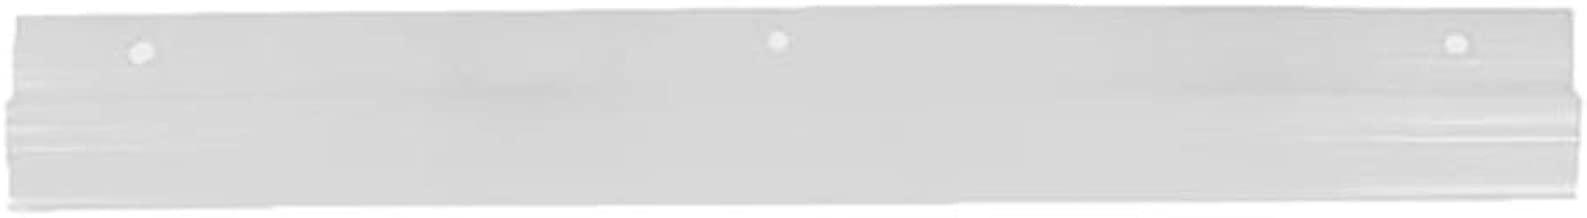 117-7717 Toro Snowblower Scraper Bar 180 Power Clear